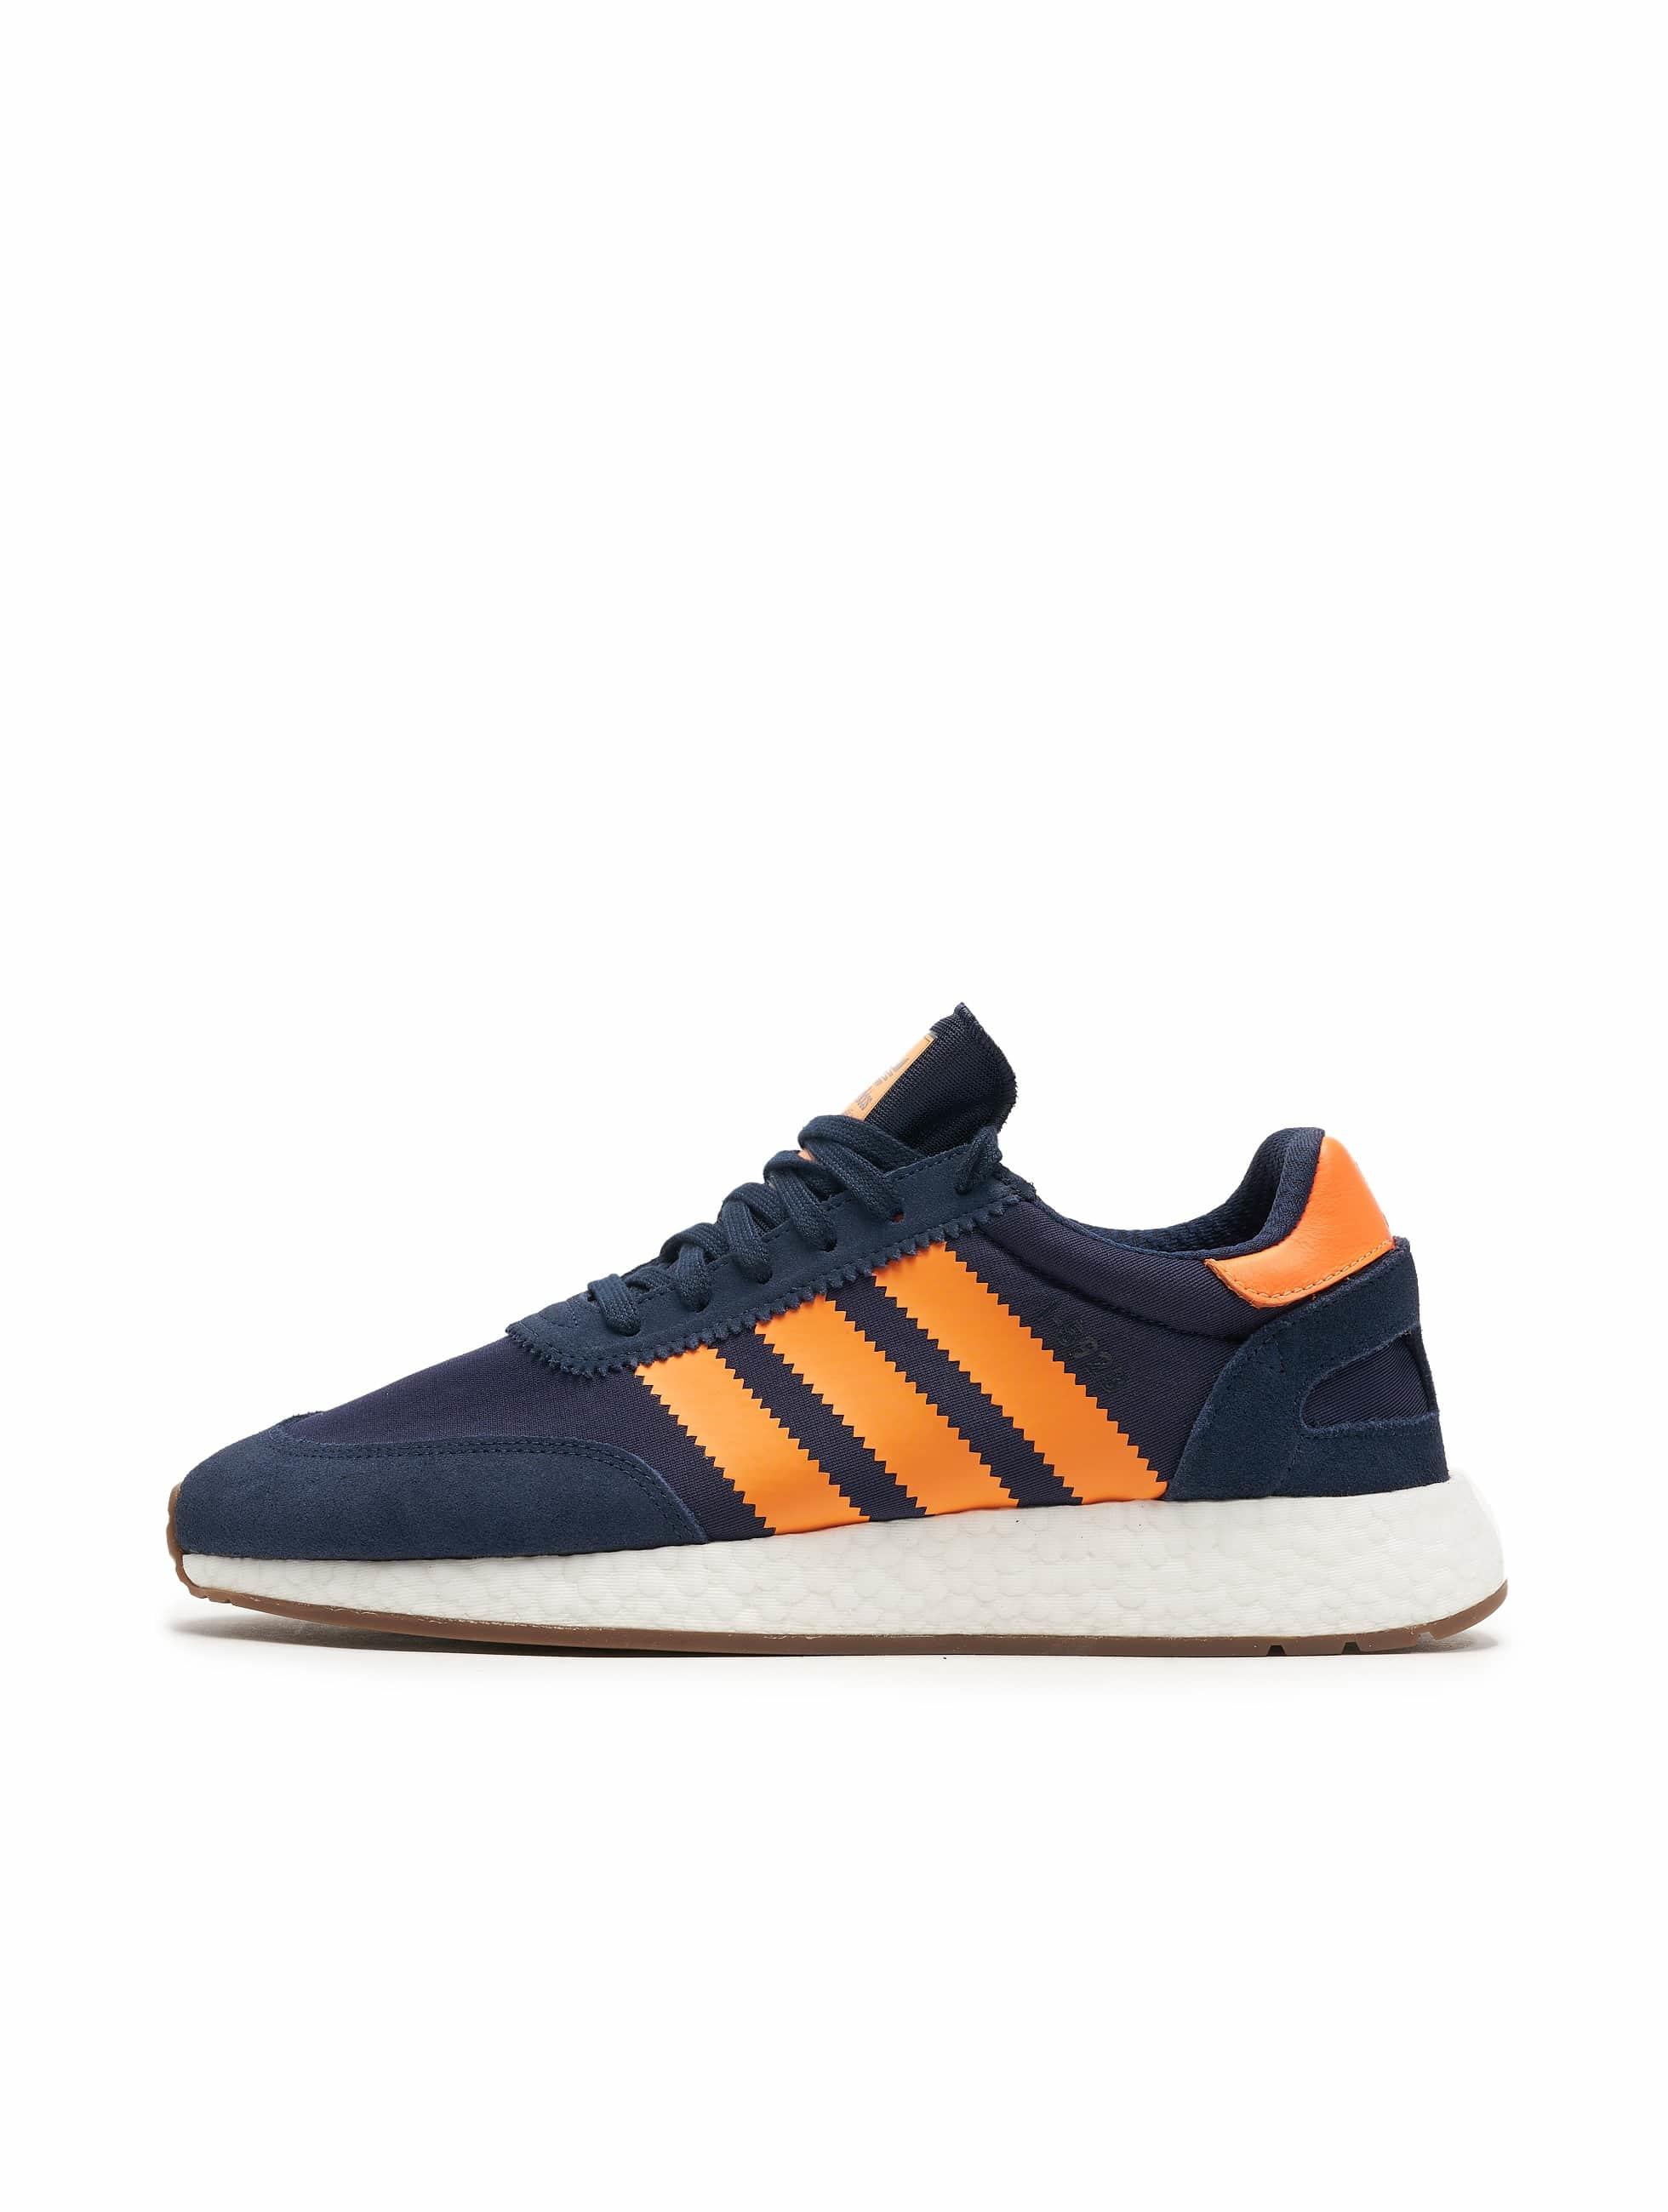 287227903e9 adidas originals schoen / sneaker I-5923 in blauw 498567